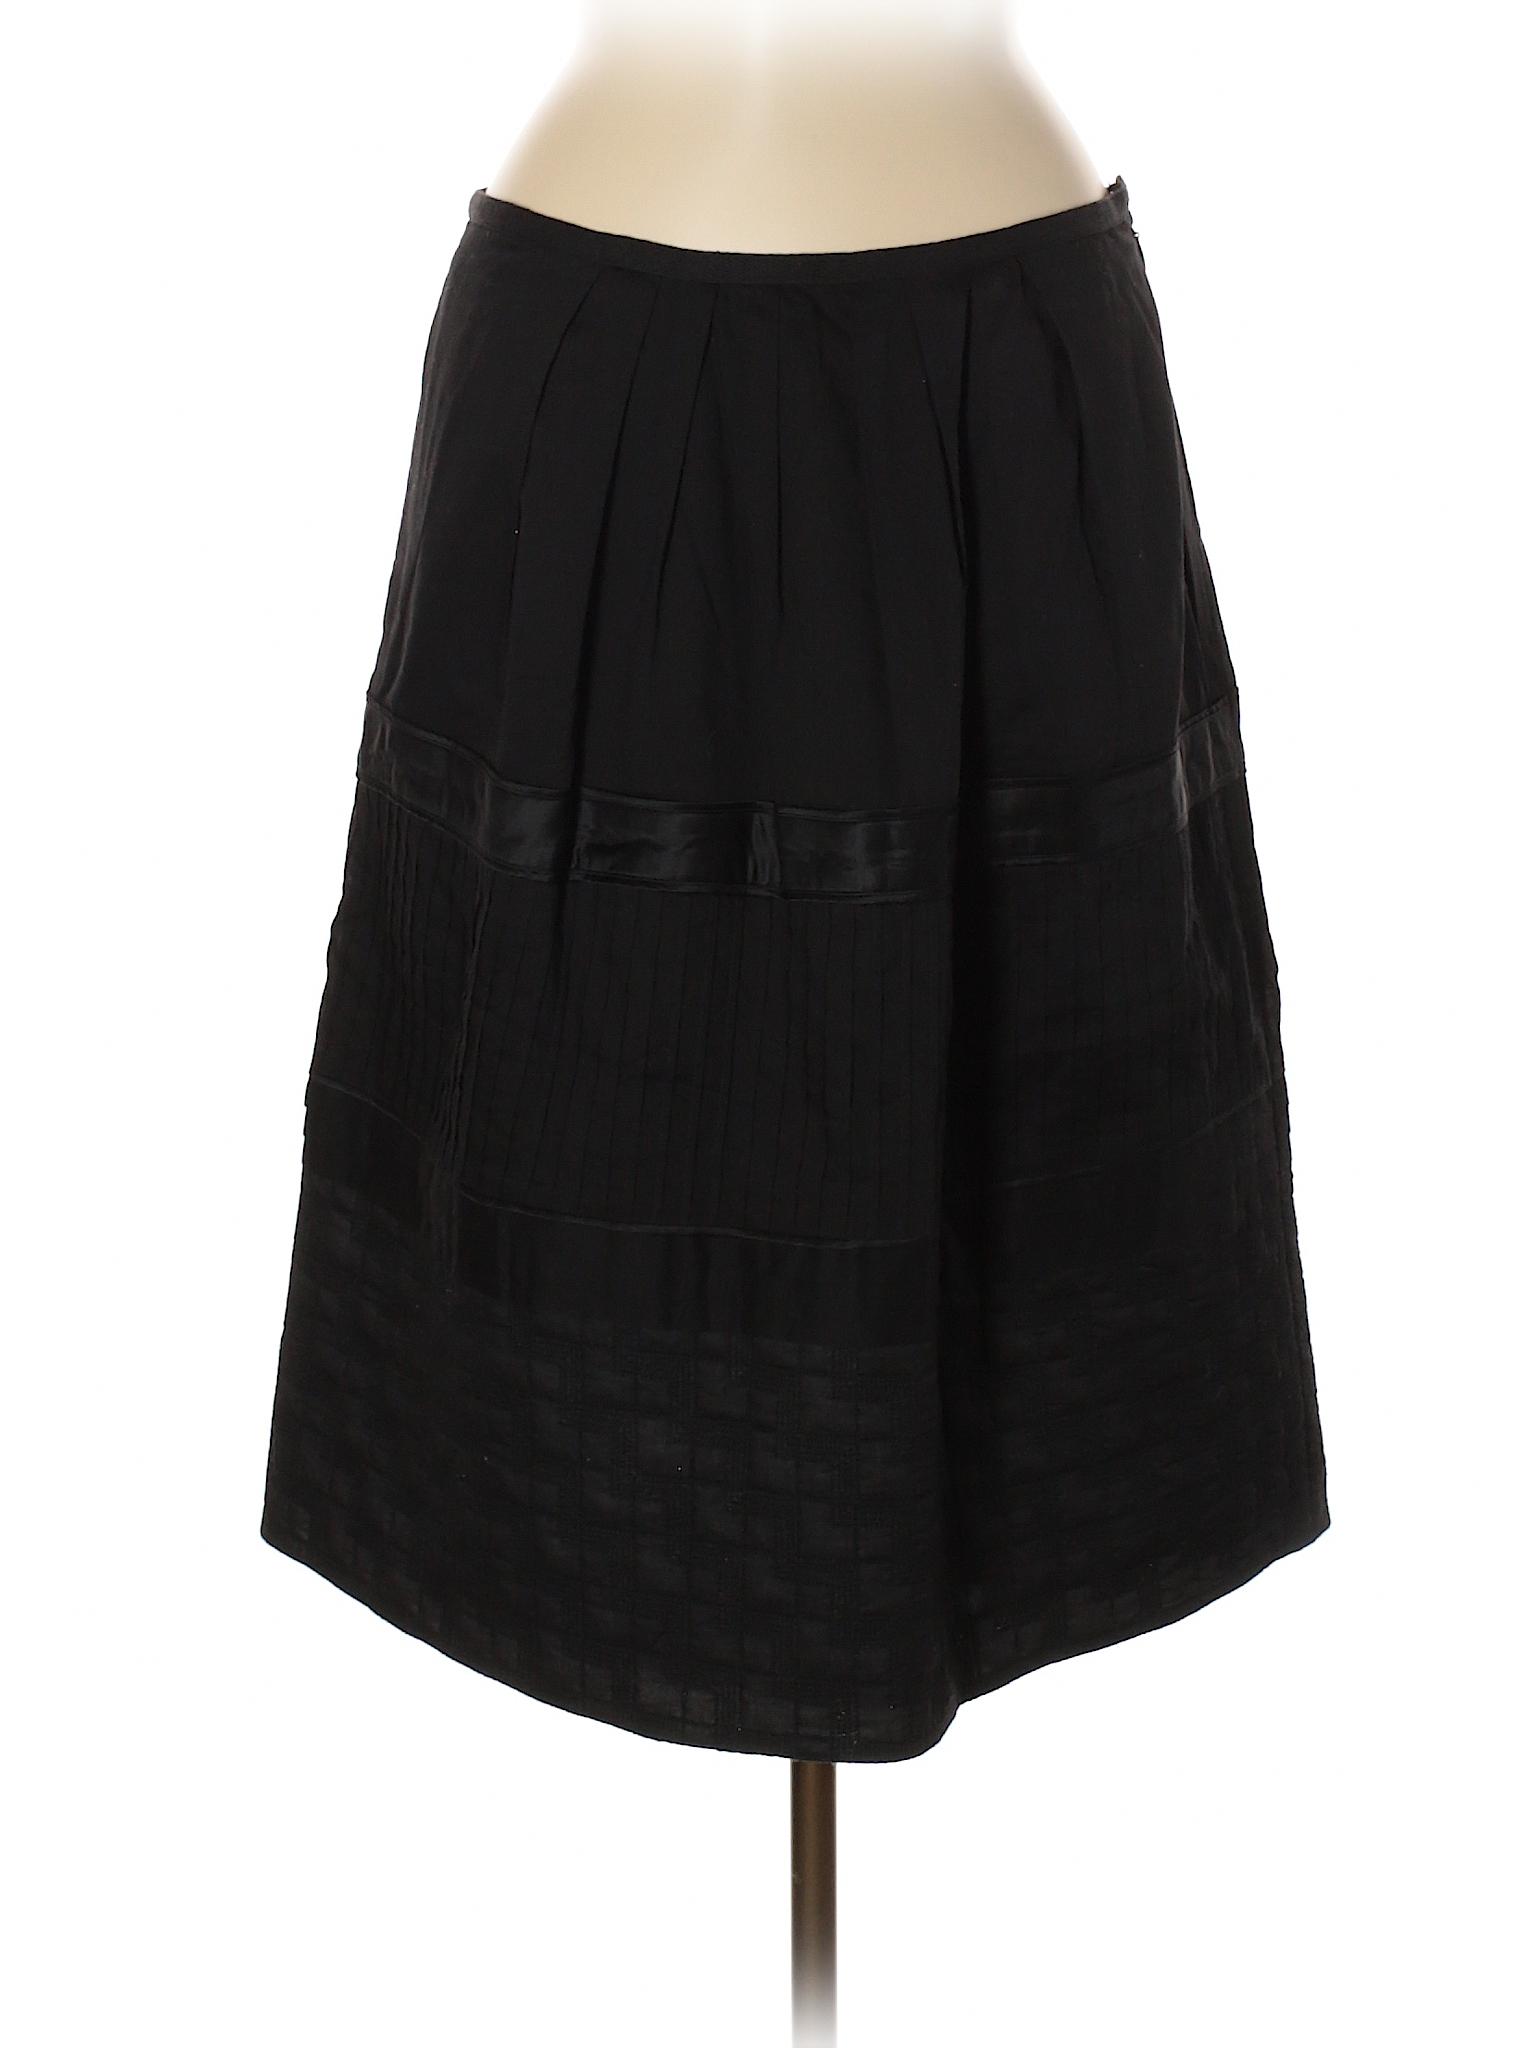 Casual Casual Casual Boutique Skirt Boutique Boutique Skirt Skirt Skirt Boutique Boutique Boutique Casual Skirt Casual fgUw1qtU